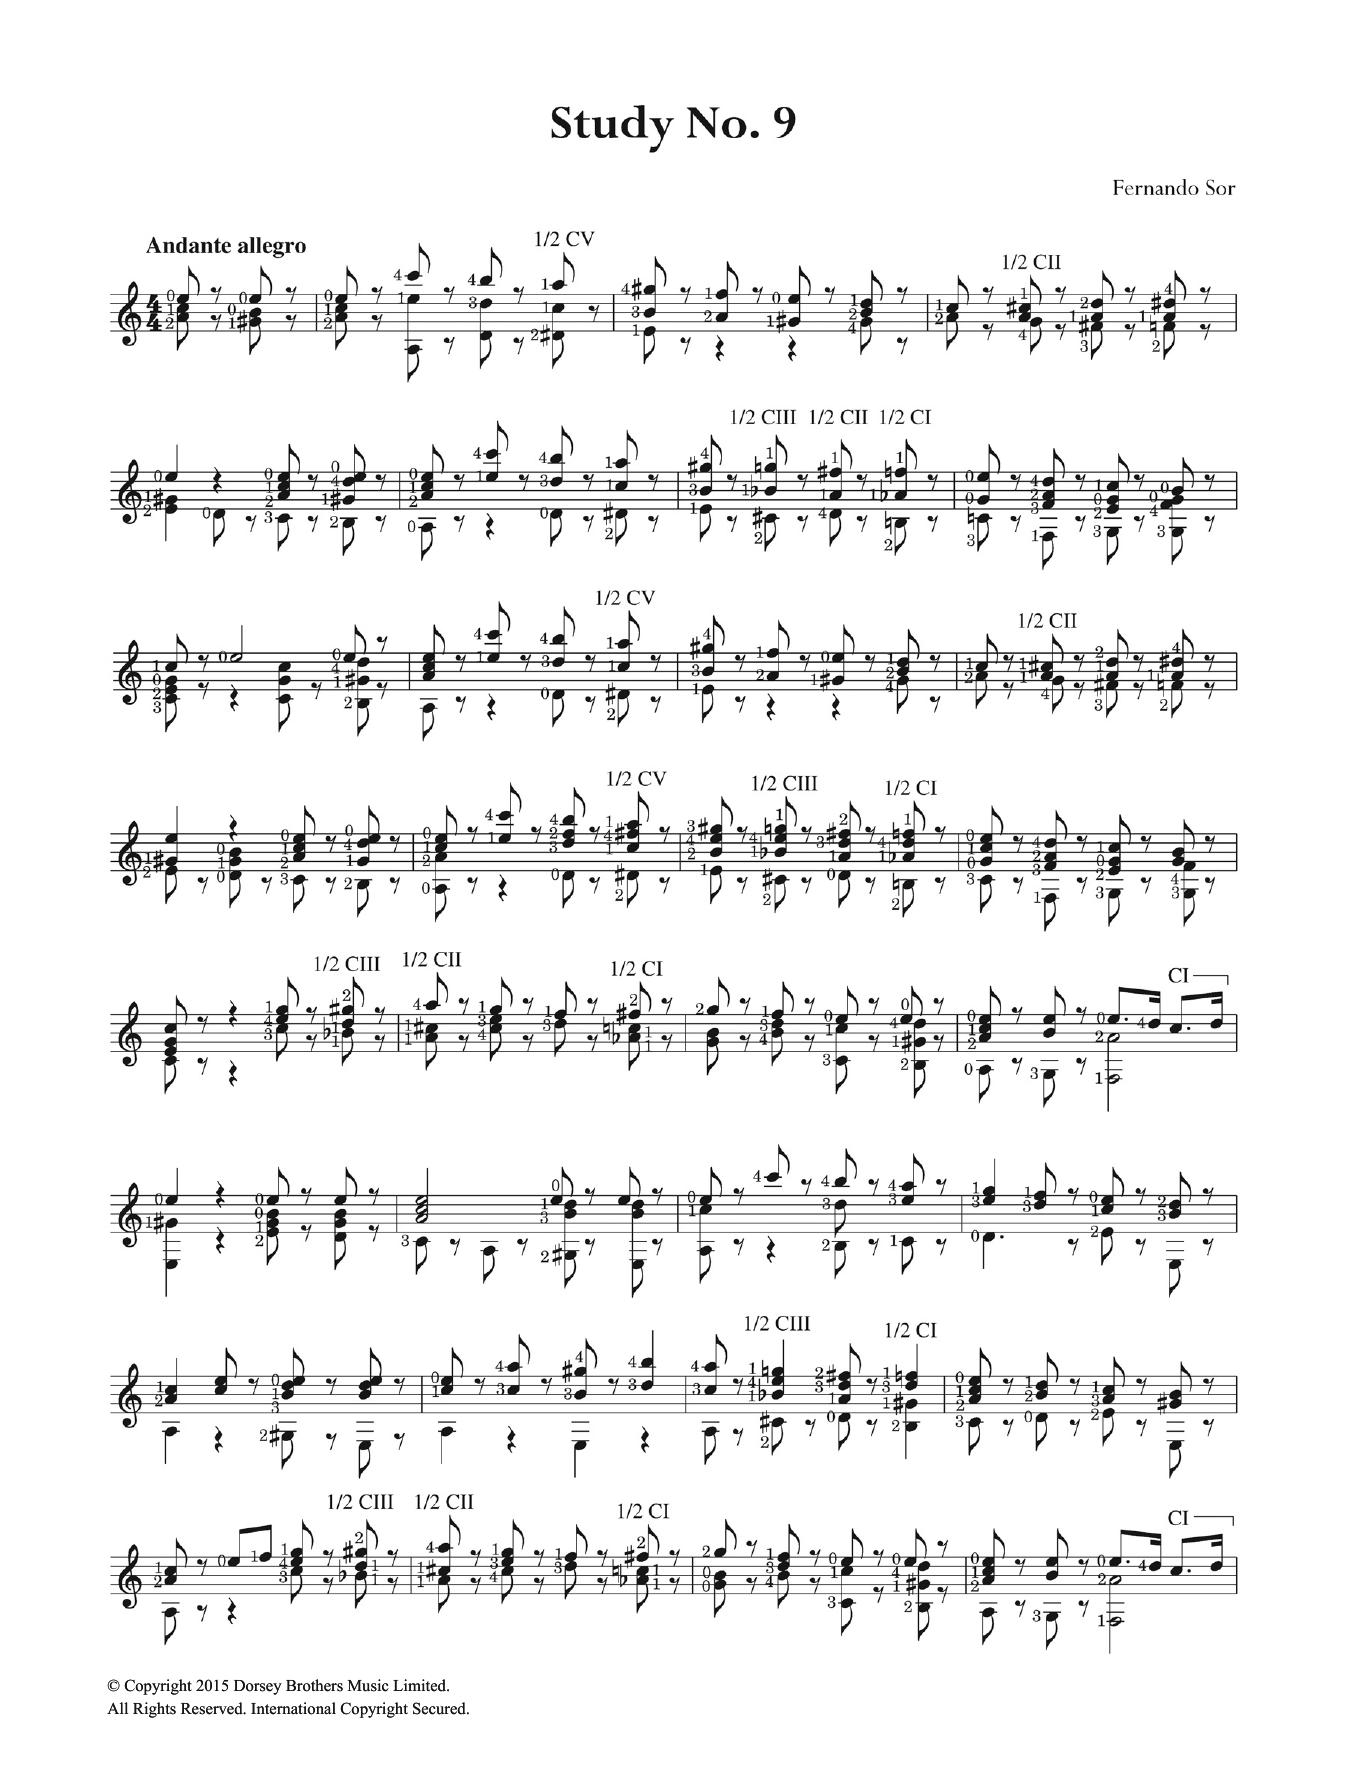 Study No. 9 Sheet Music